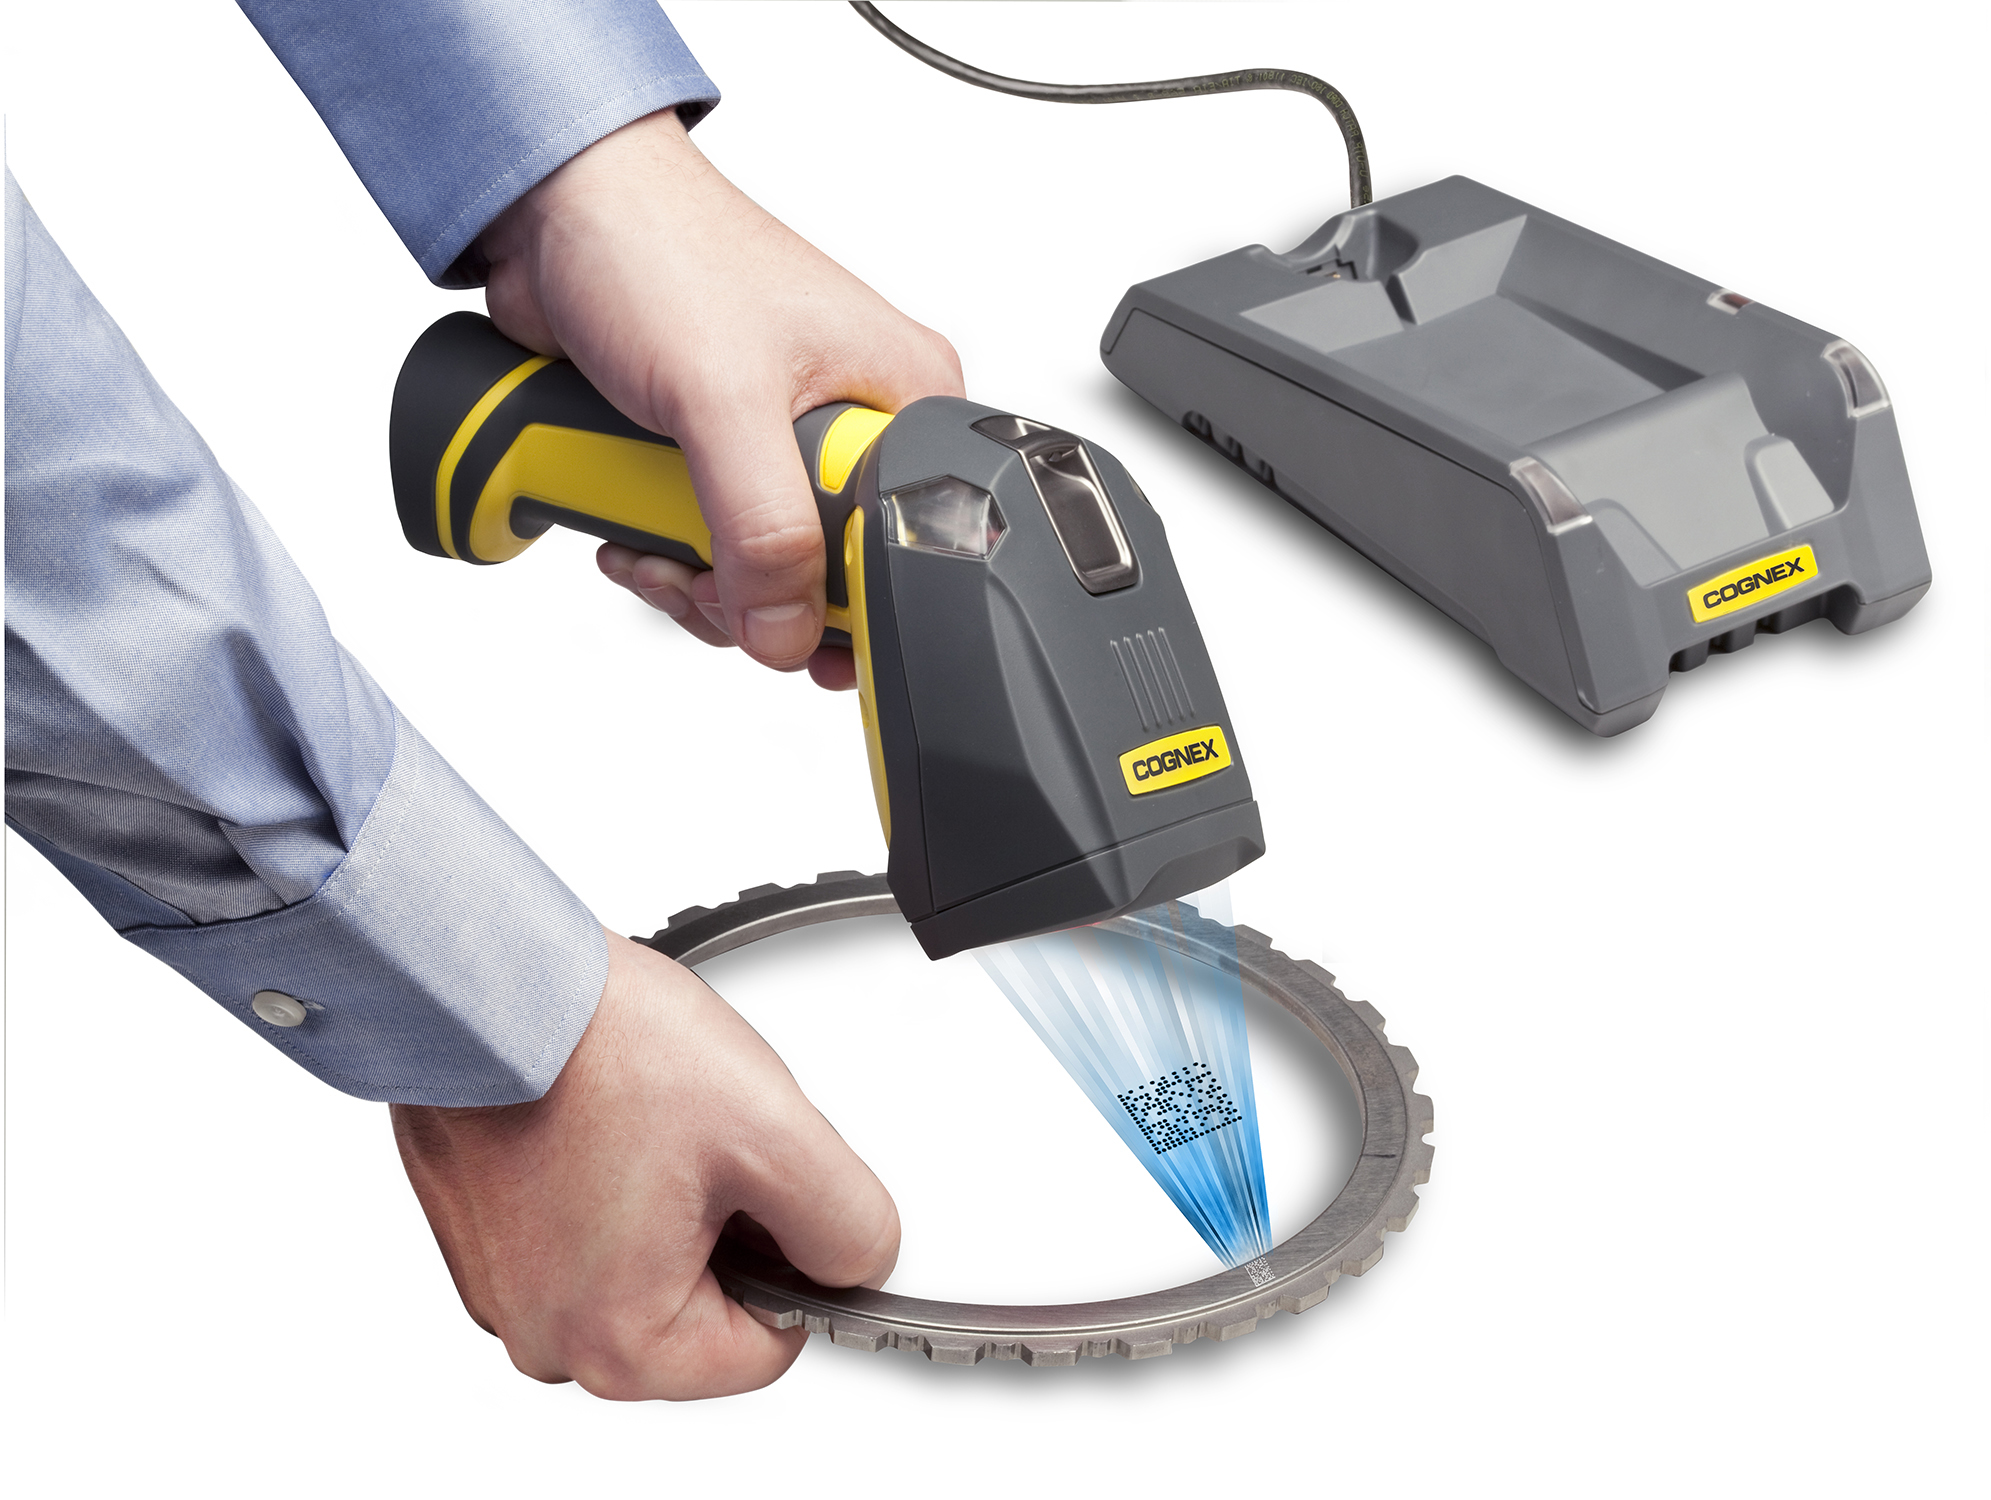 Cognex DataMan 8000 series wireless handheld reading small DPM code on gear